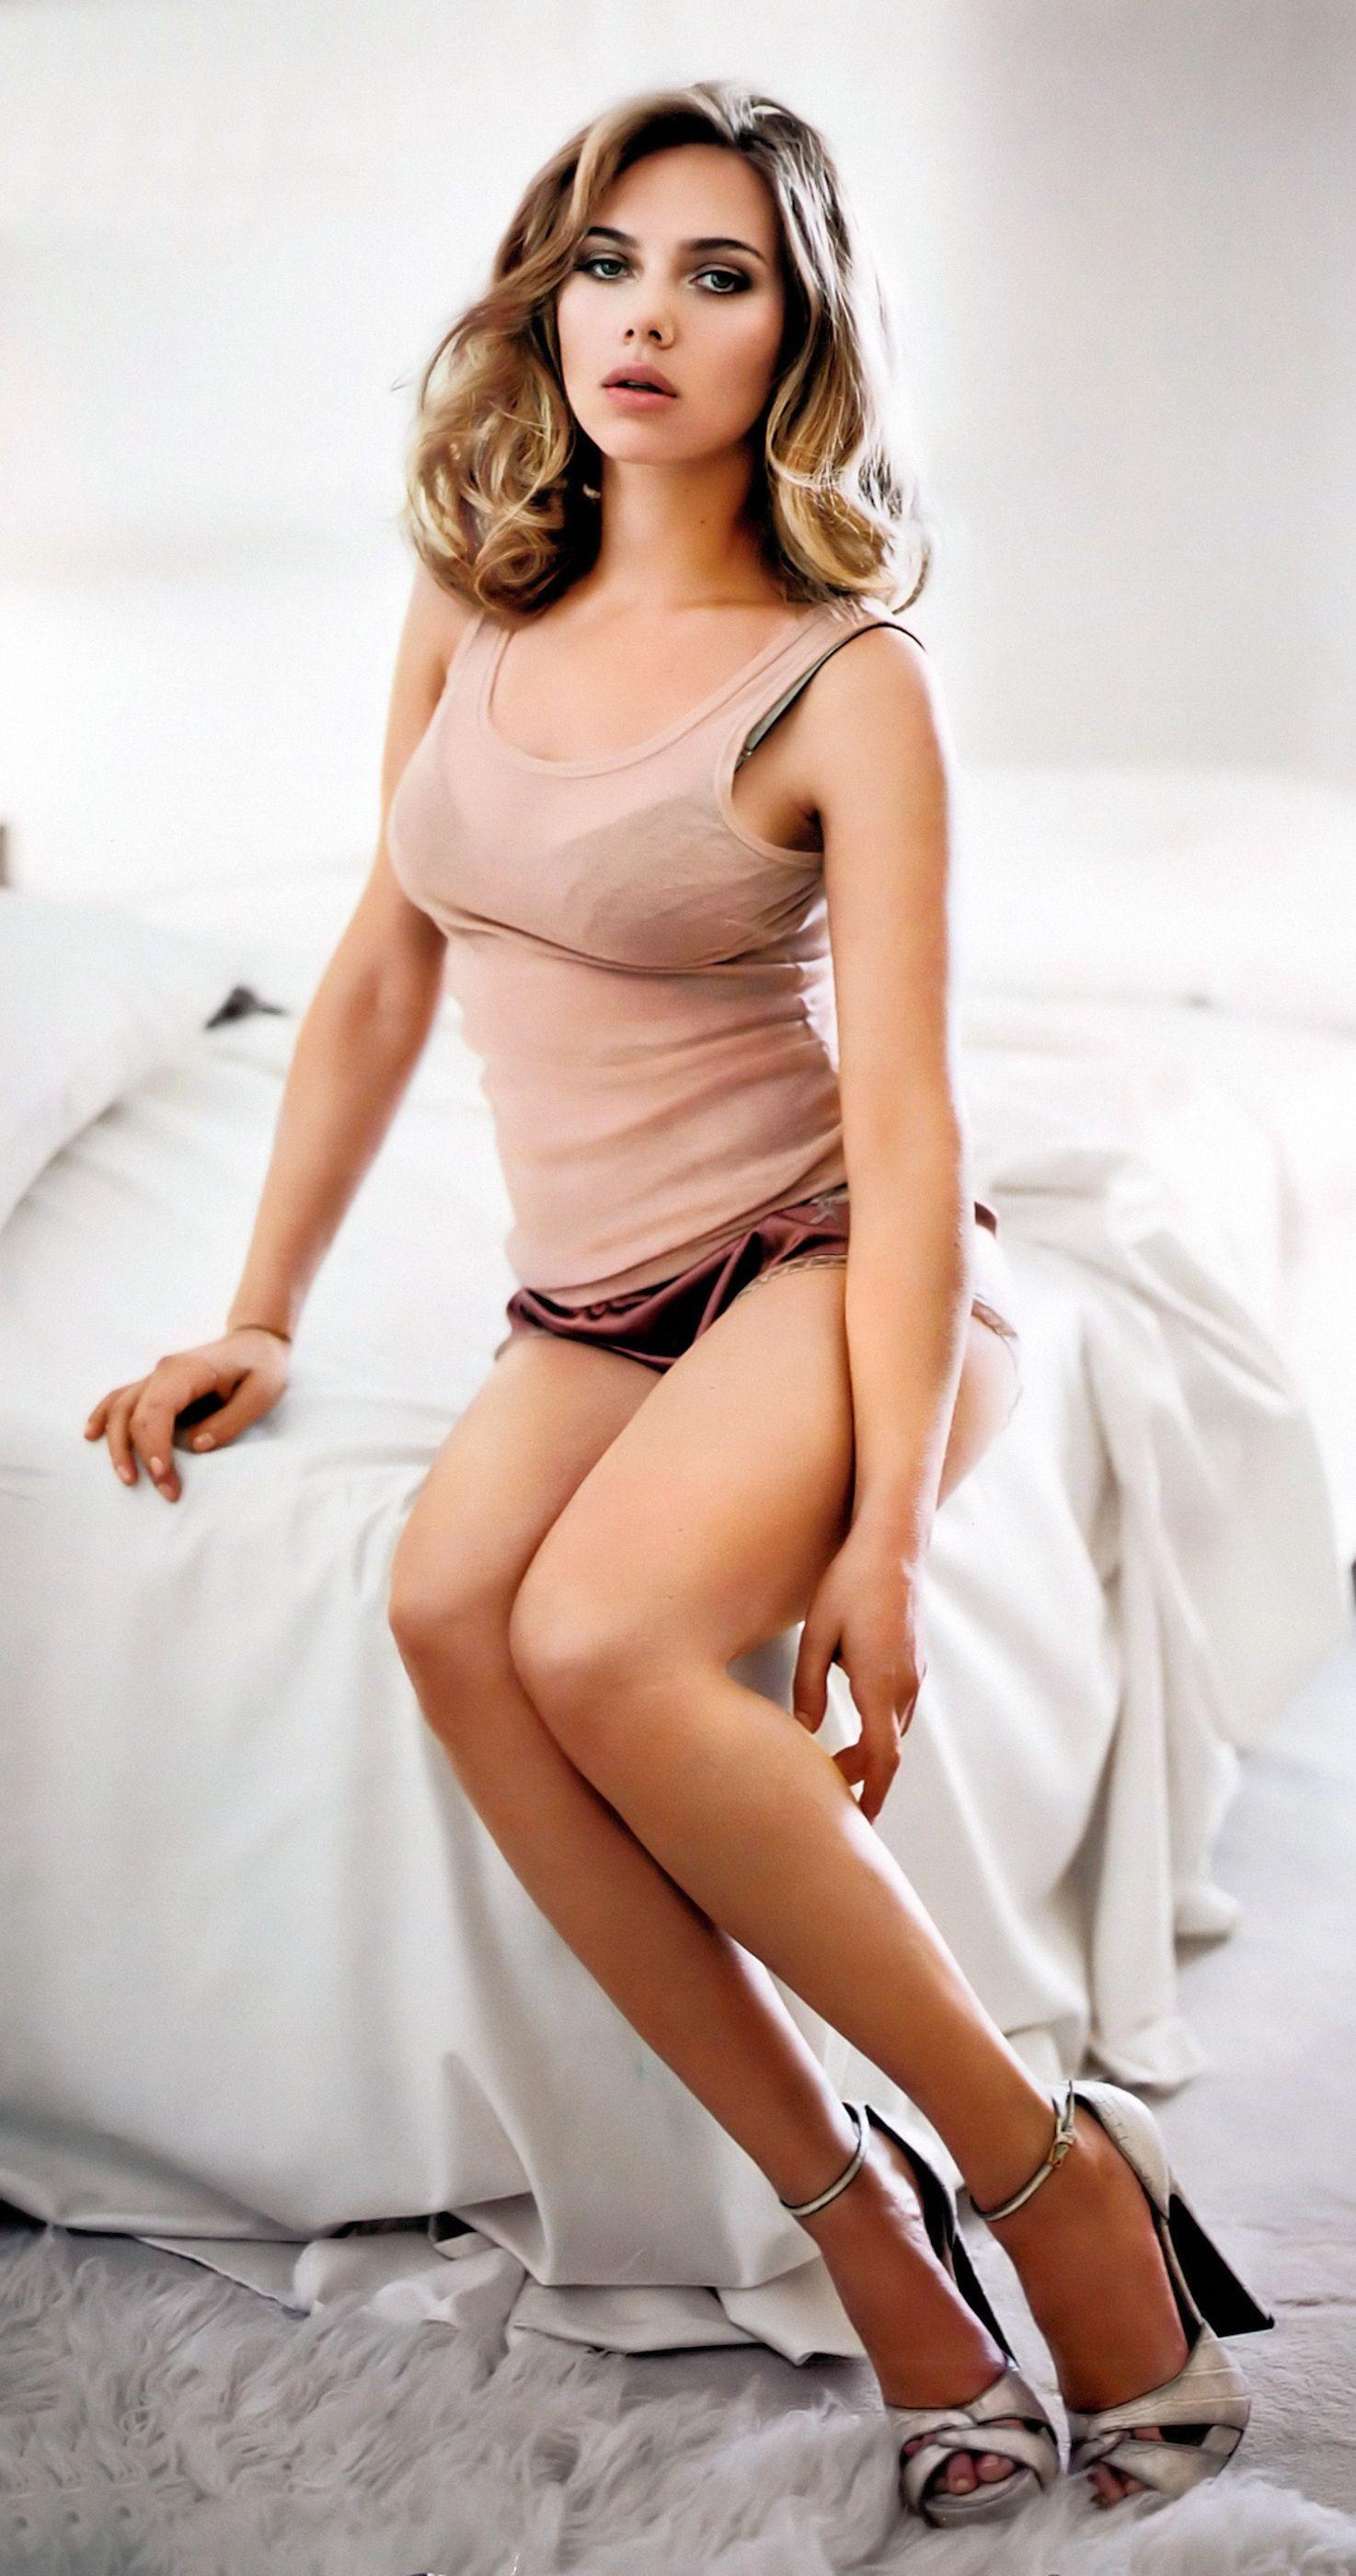 Scarlett Johansson Sexiest Woman Esquire Photos Scarlett